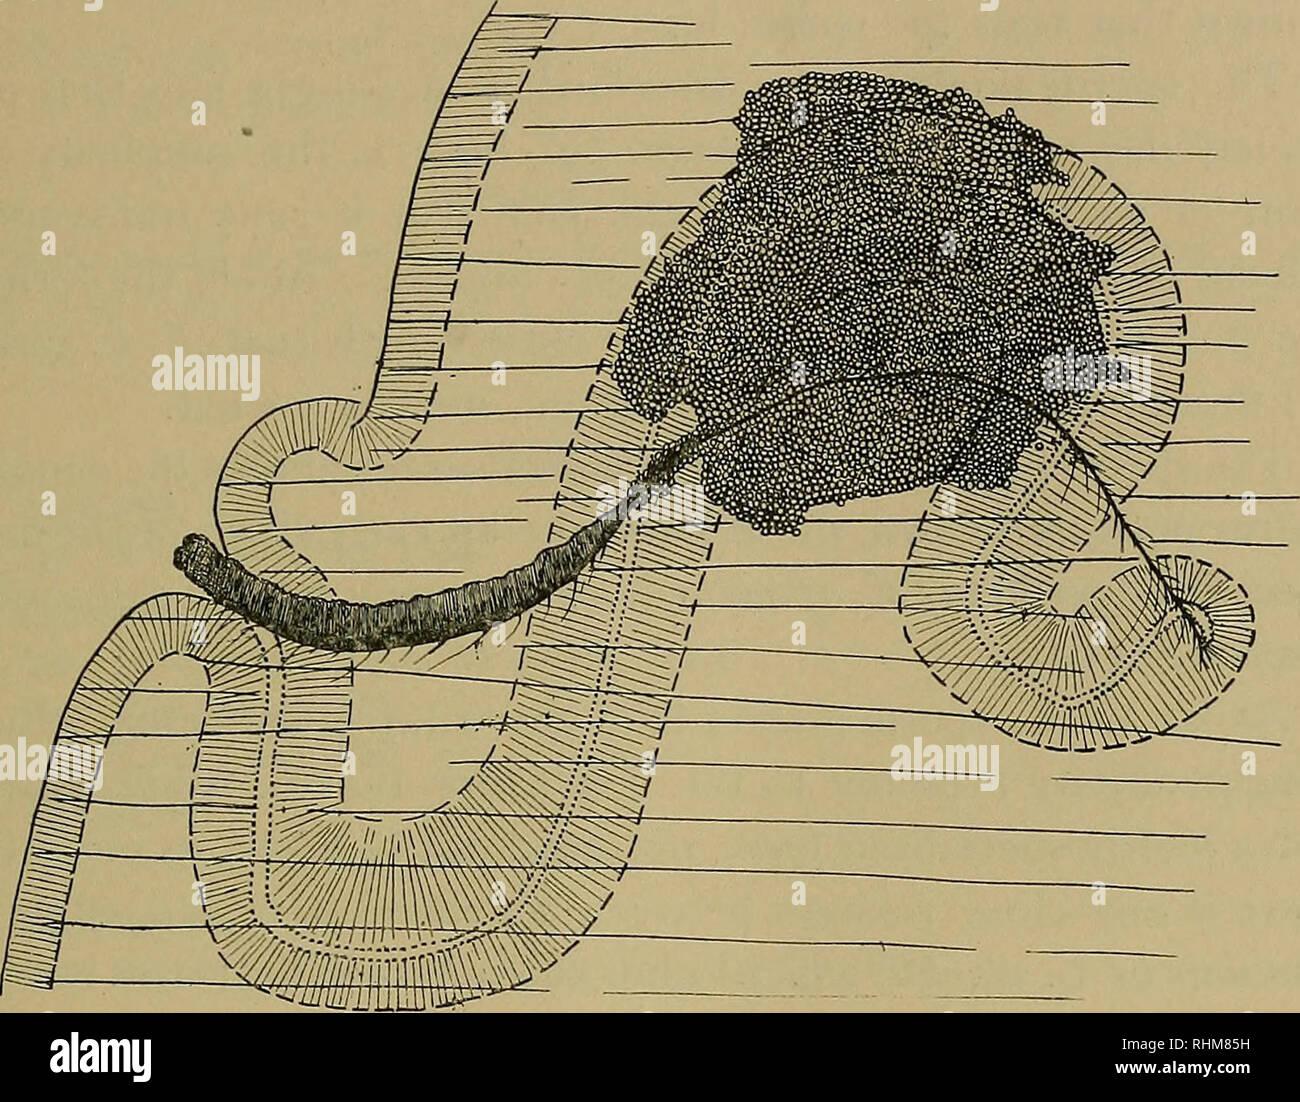 Bilder Seite 22 Sperm The Stockfotosamp; Alamy Its f6gyb7